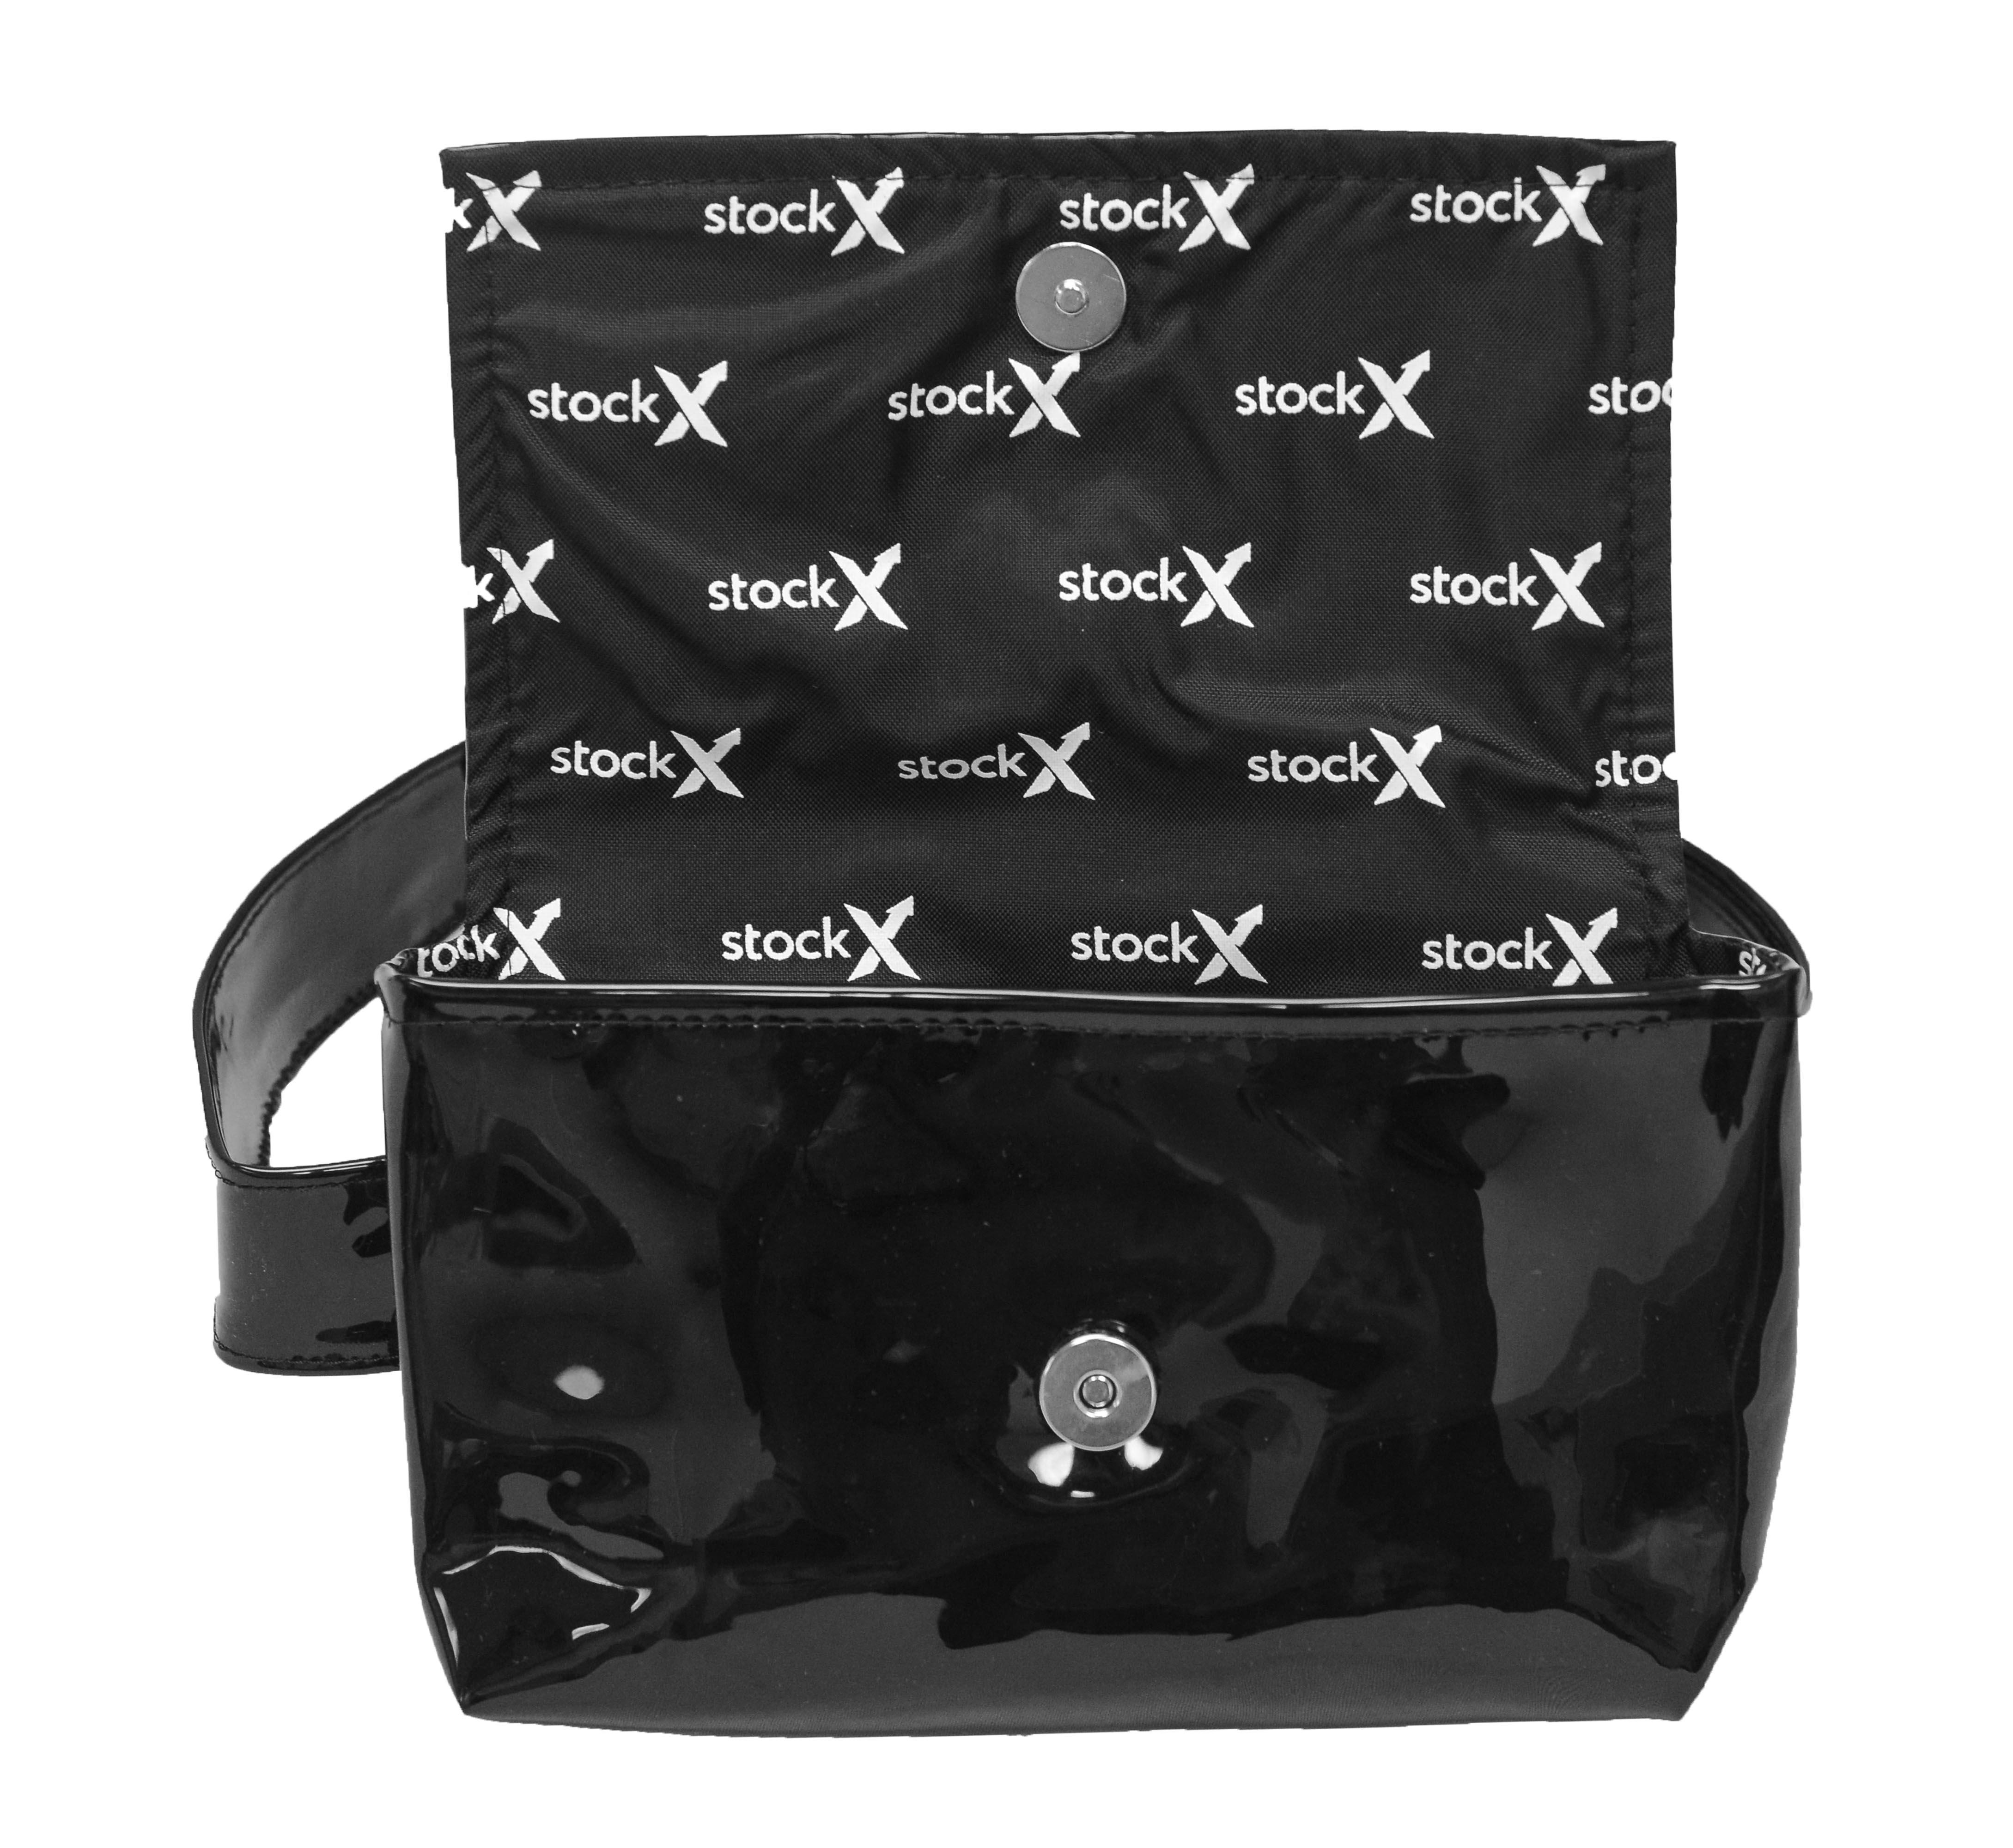 Stock X Patent Fanny Pack - LBU